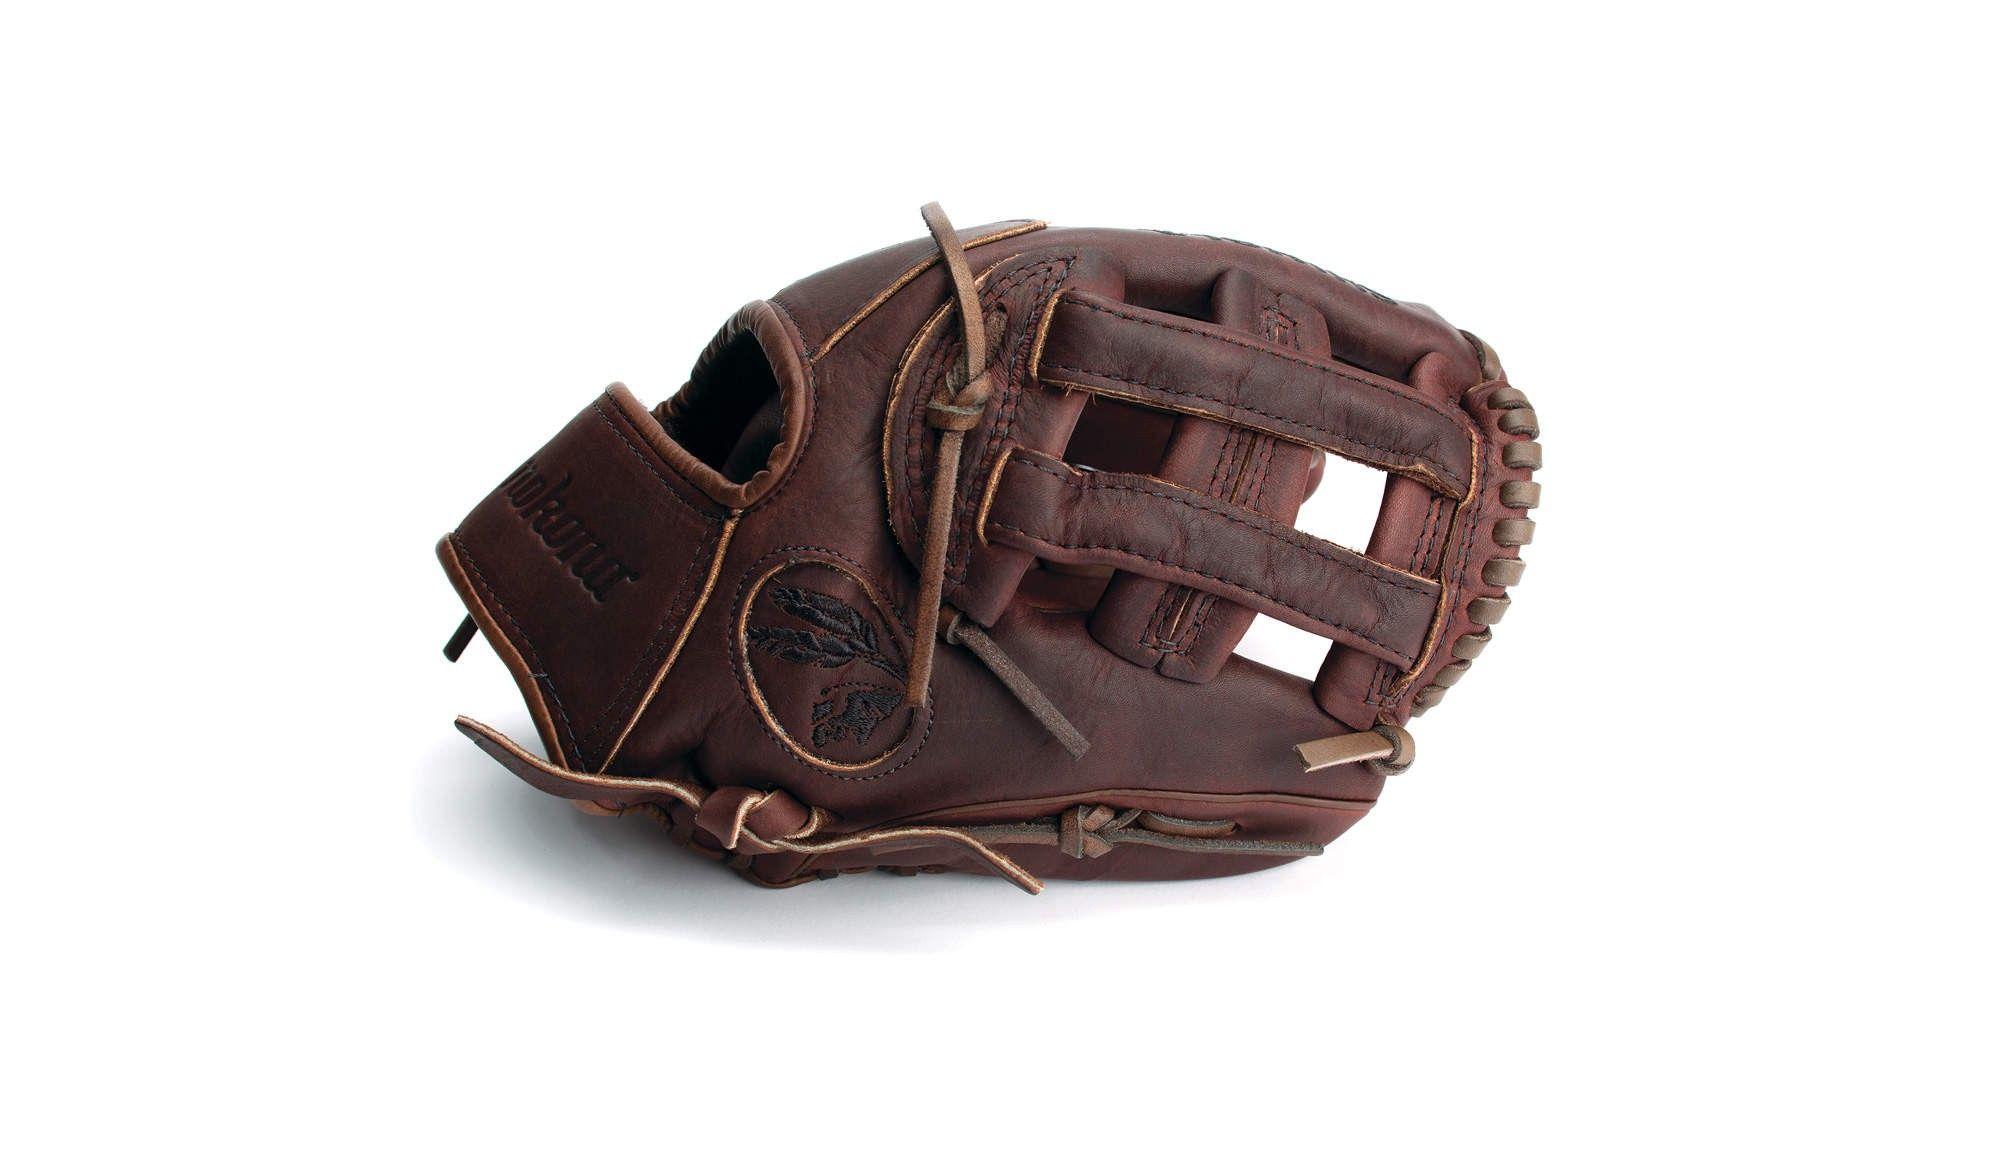 Shinola Nokona Baseball Glove Navy Rawlings Pro Preferred Baseball Glove Rawlings